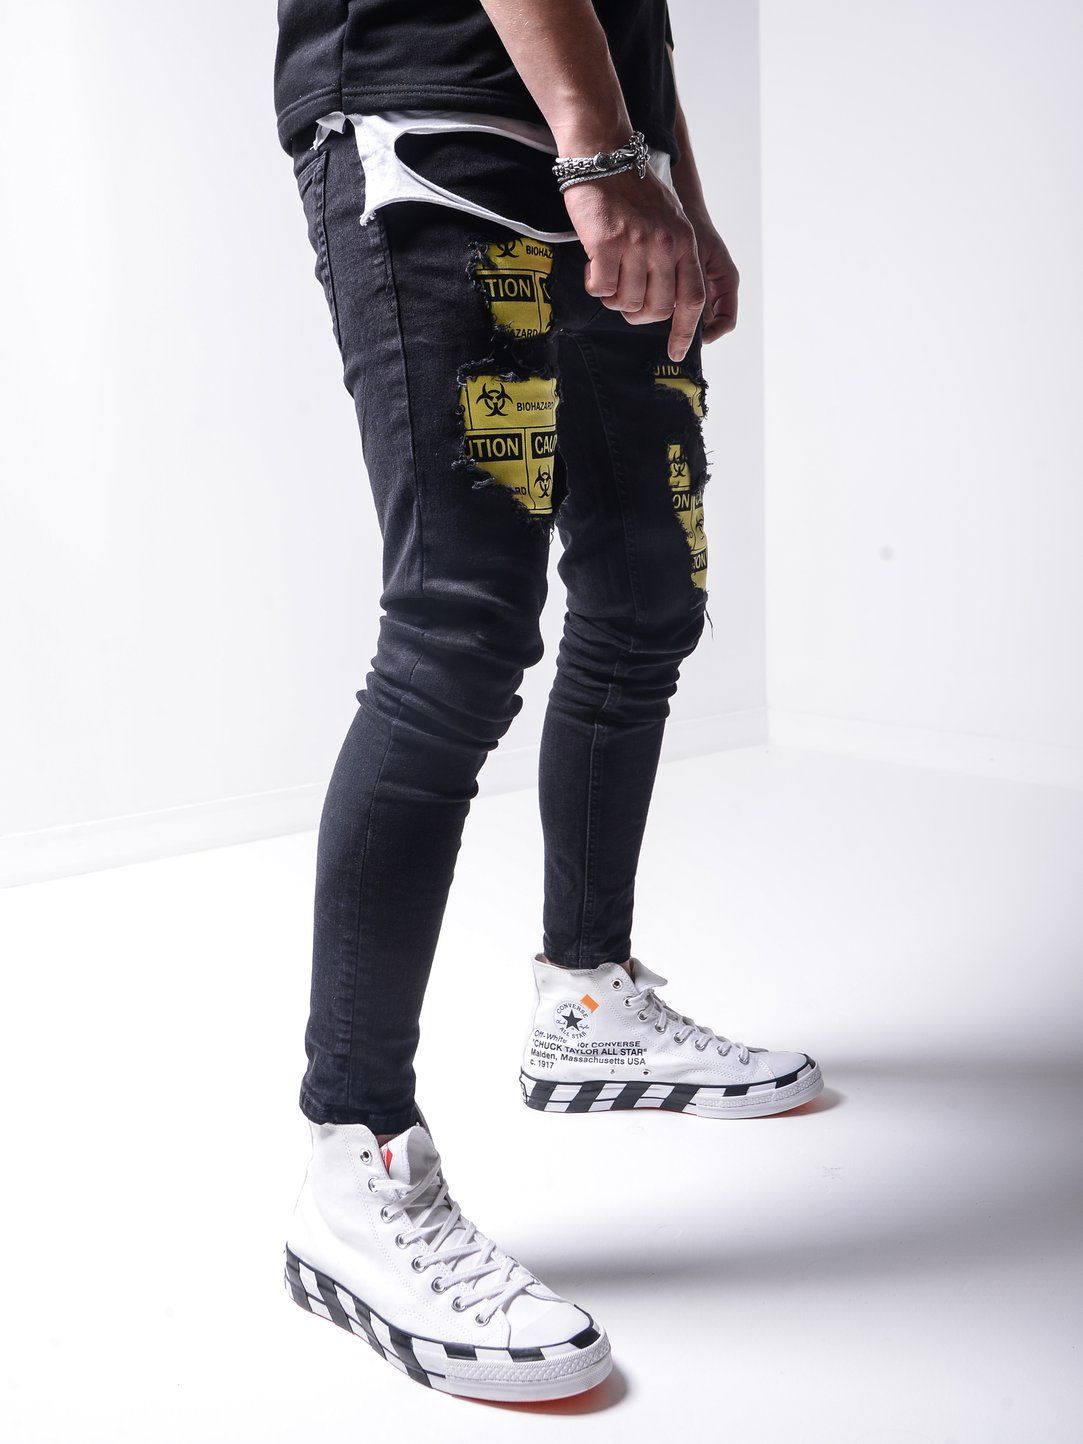 11 Ideas De Pantalones Pantalones Ropa De Hombre Ropa Casual Hombres